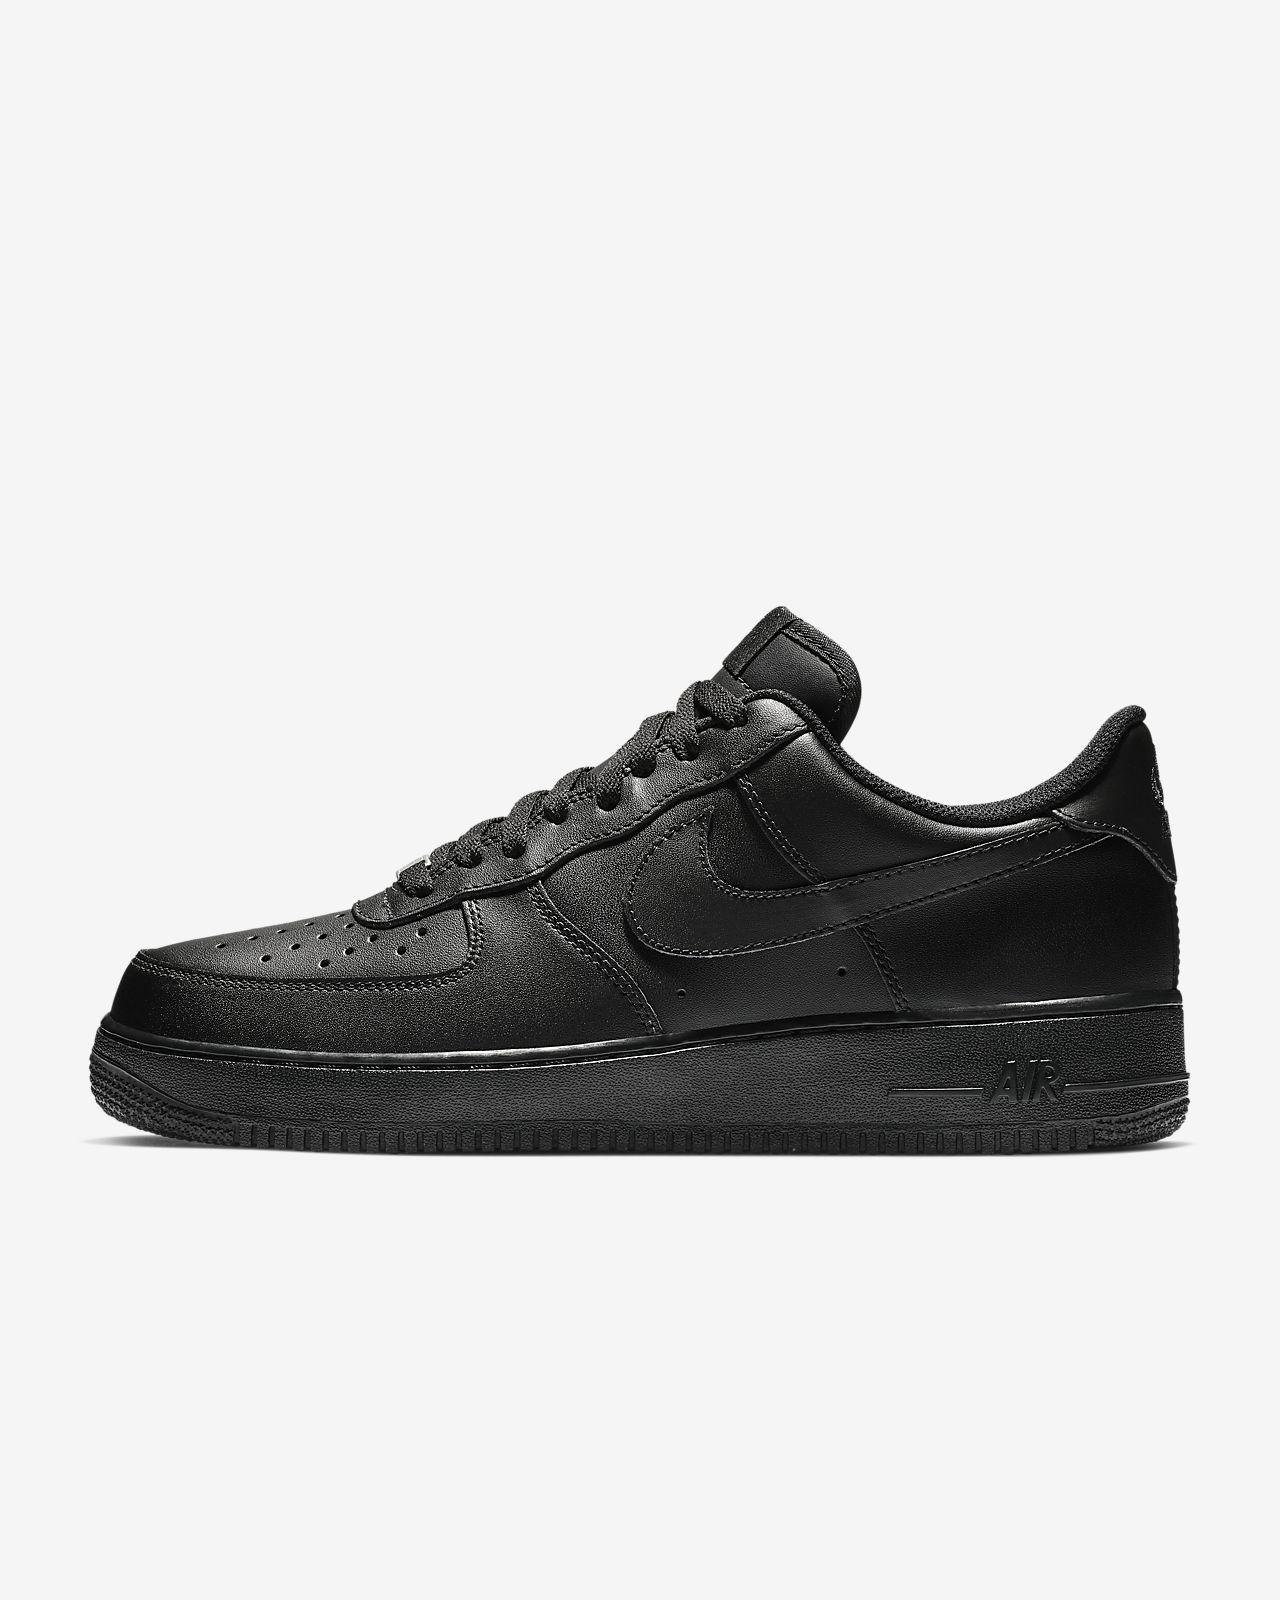 Nike Air Force 1 '07 Triple Black Herrenschuh